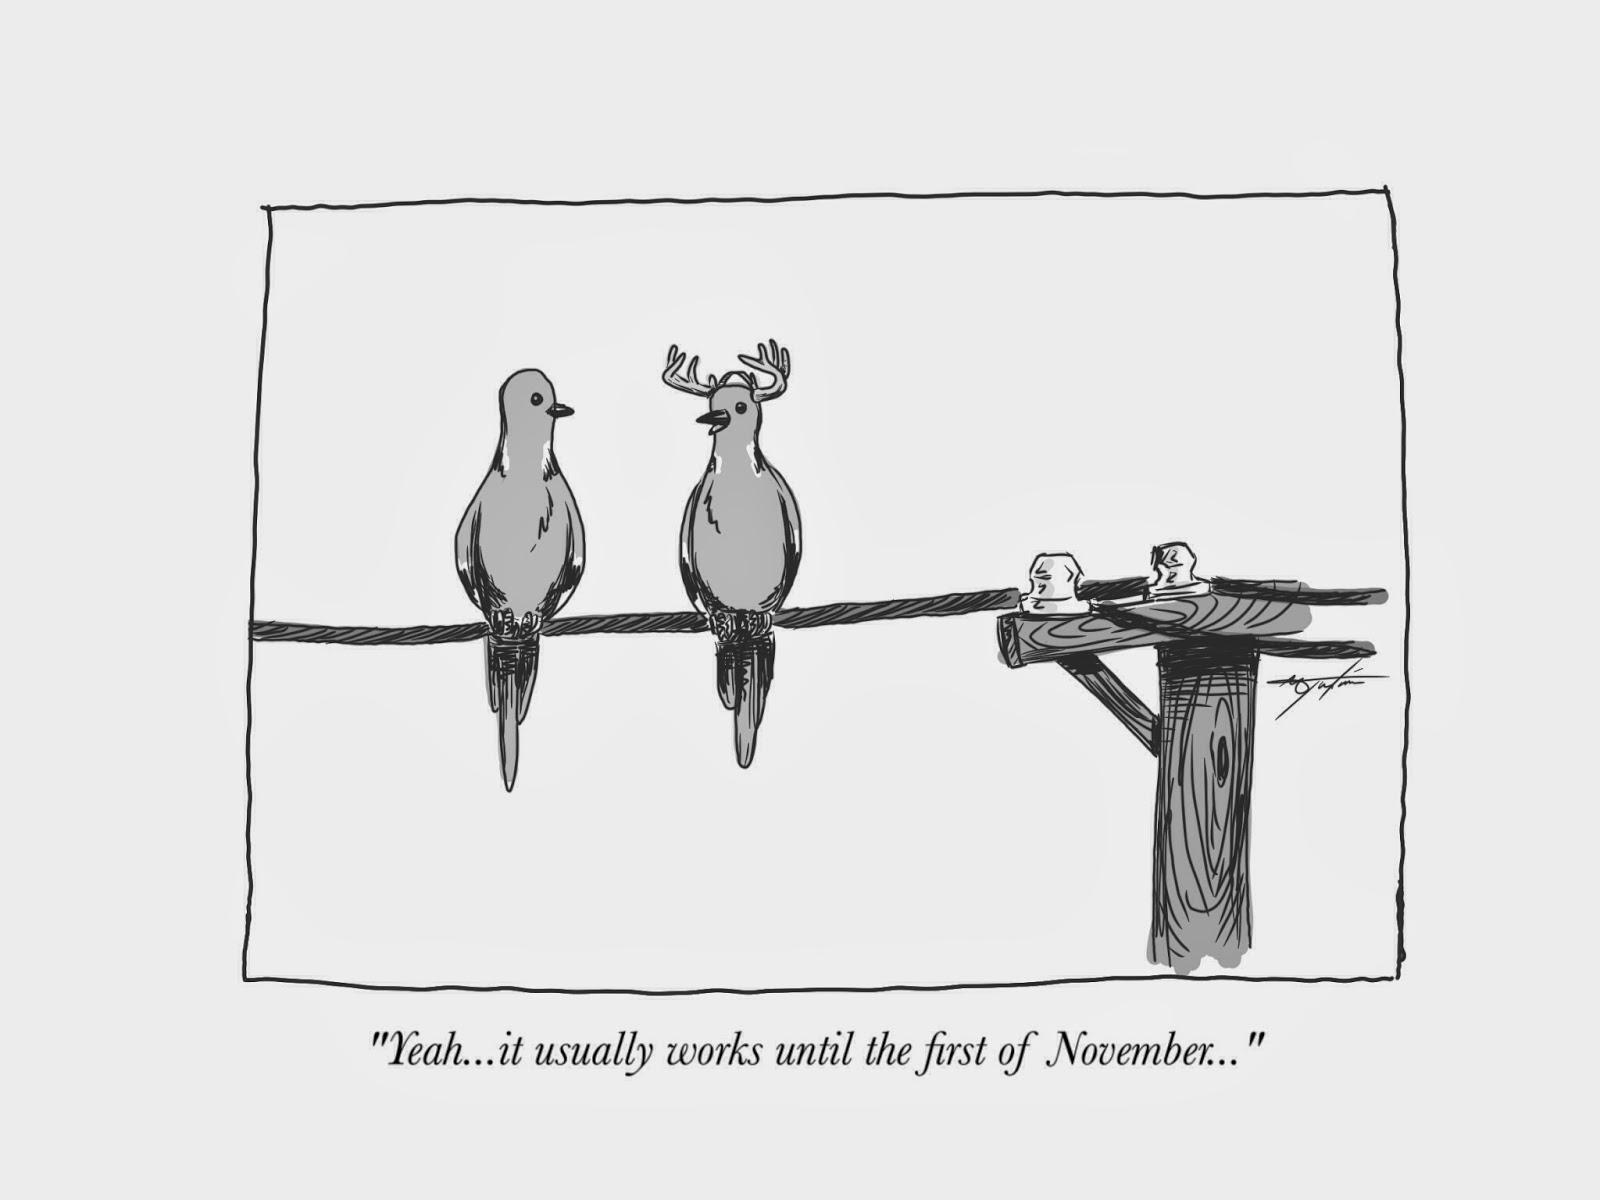 The Broken Compass Journal: Dove Hunting Cartoons